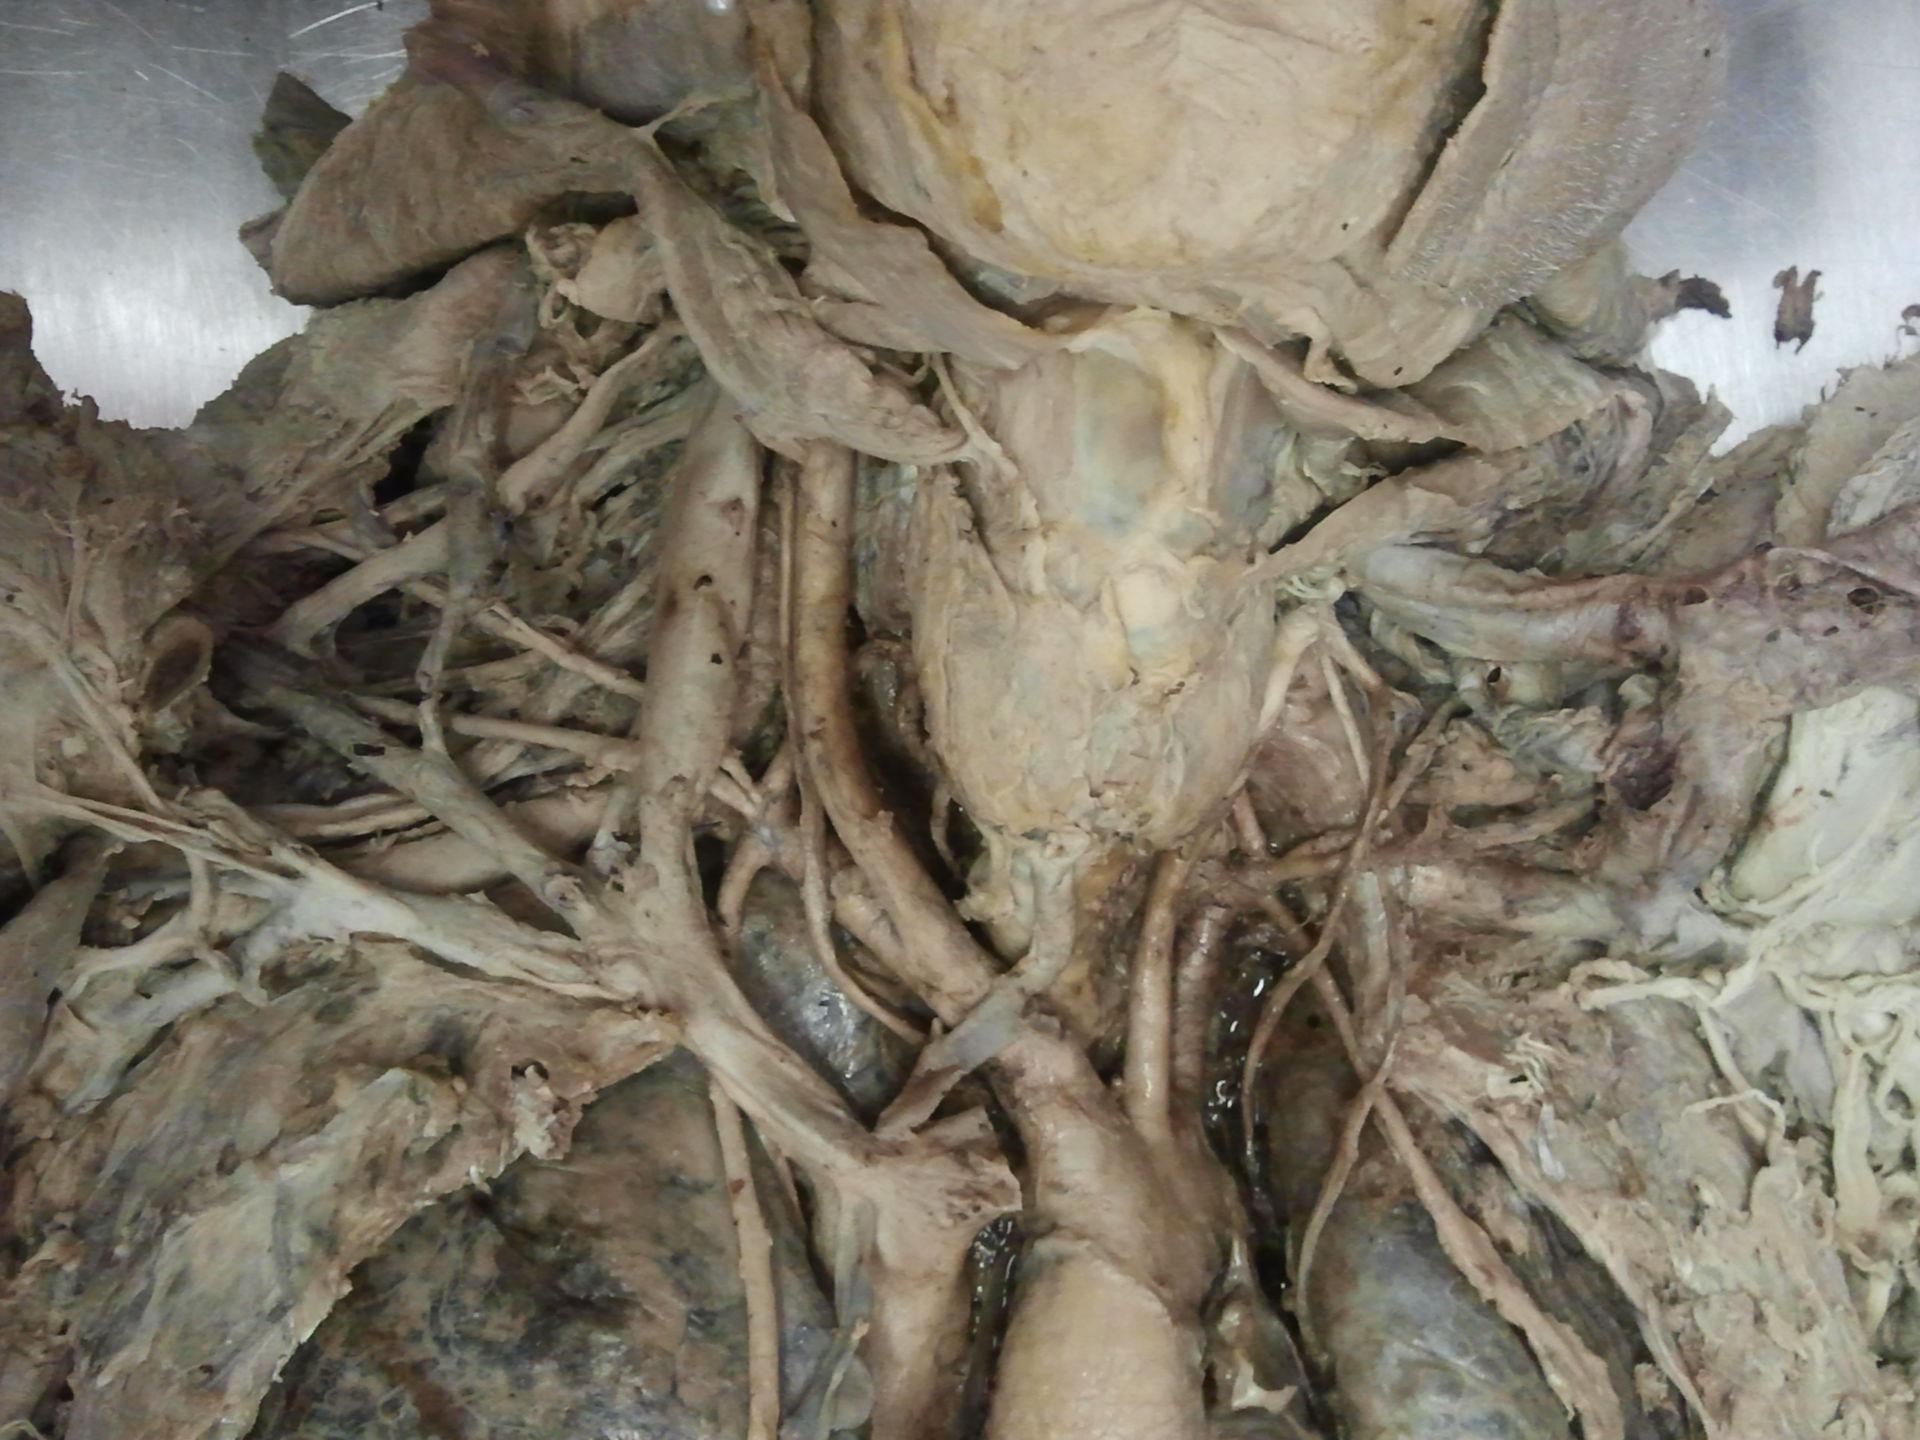 Vena thyreoidea ima